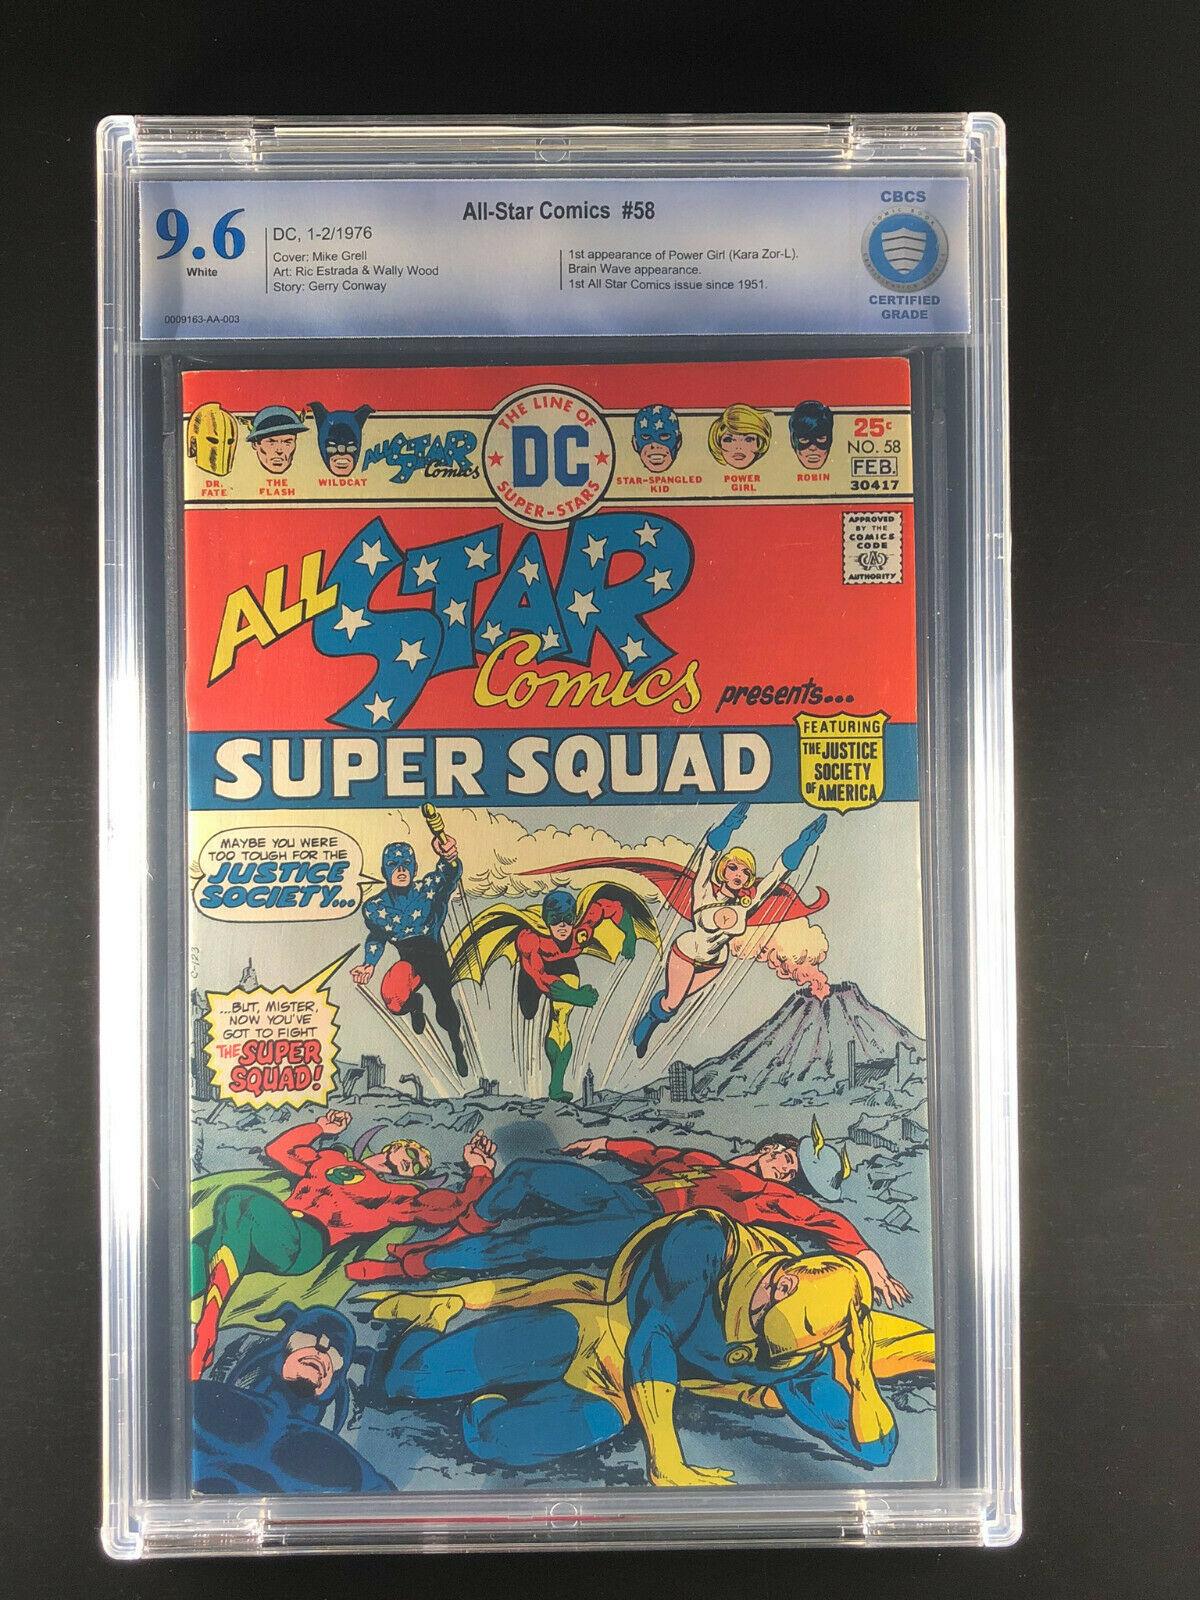 All Star Comics 58 CBCS 9.6 1st appearance Power Girl Kara Zor-L Karen Starr J